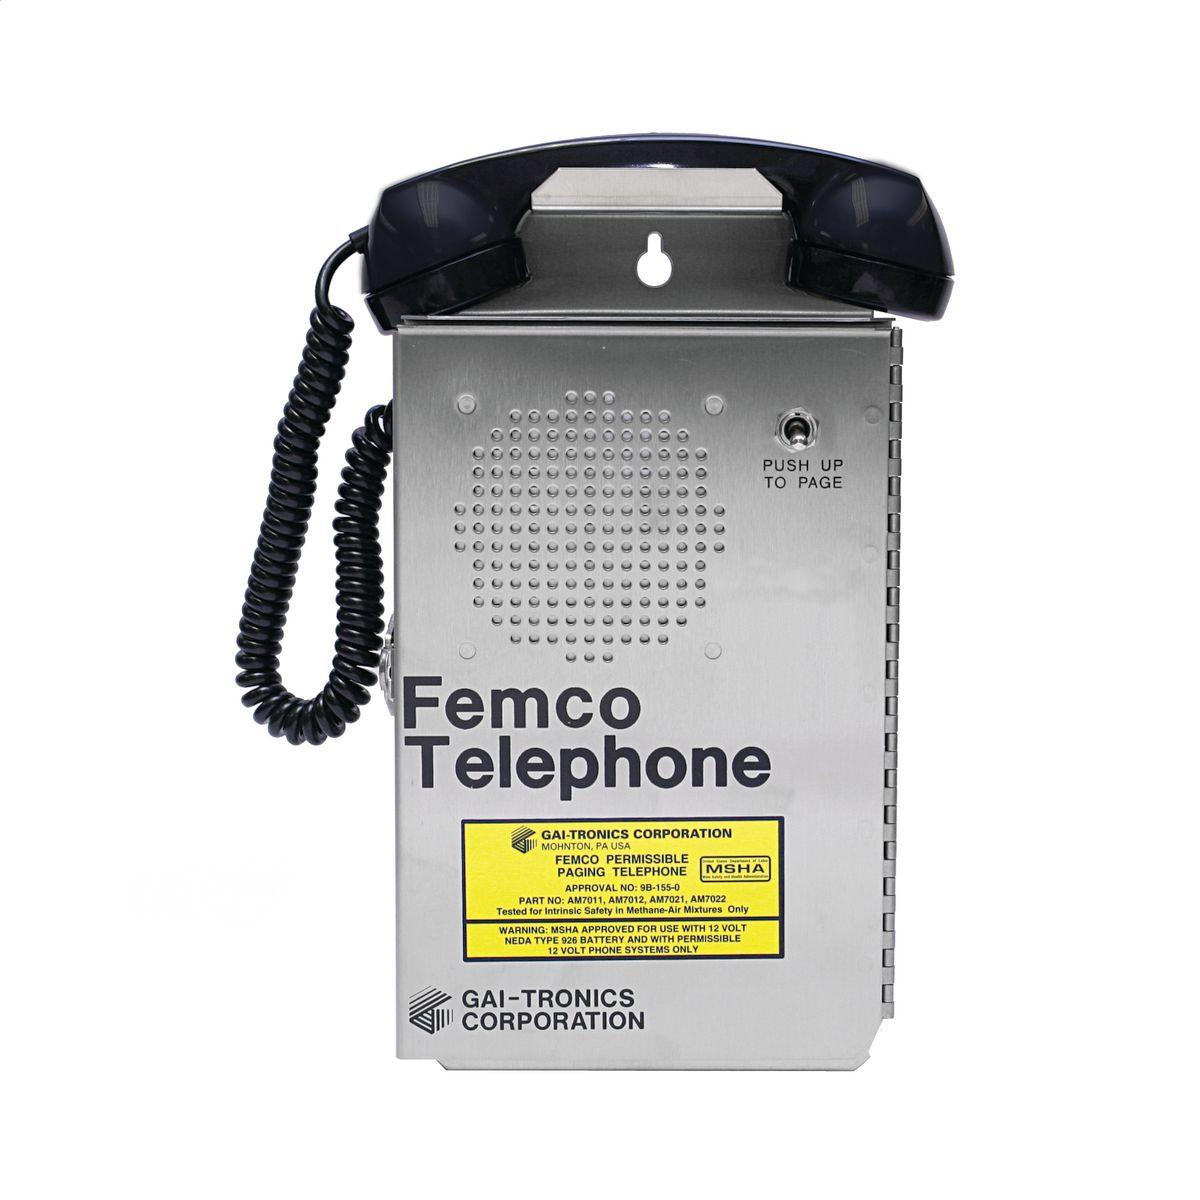 Loudspeaking Telephone - AM7011 | Brand | GAI-Tronics